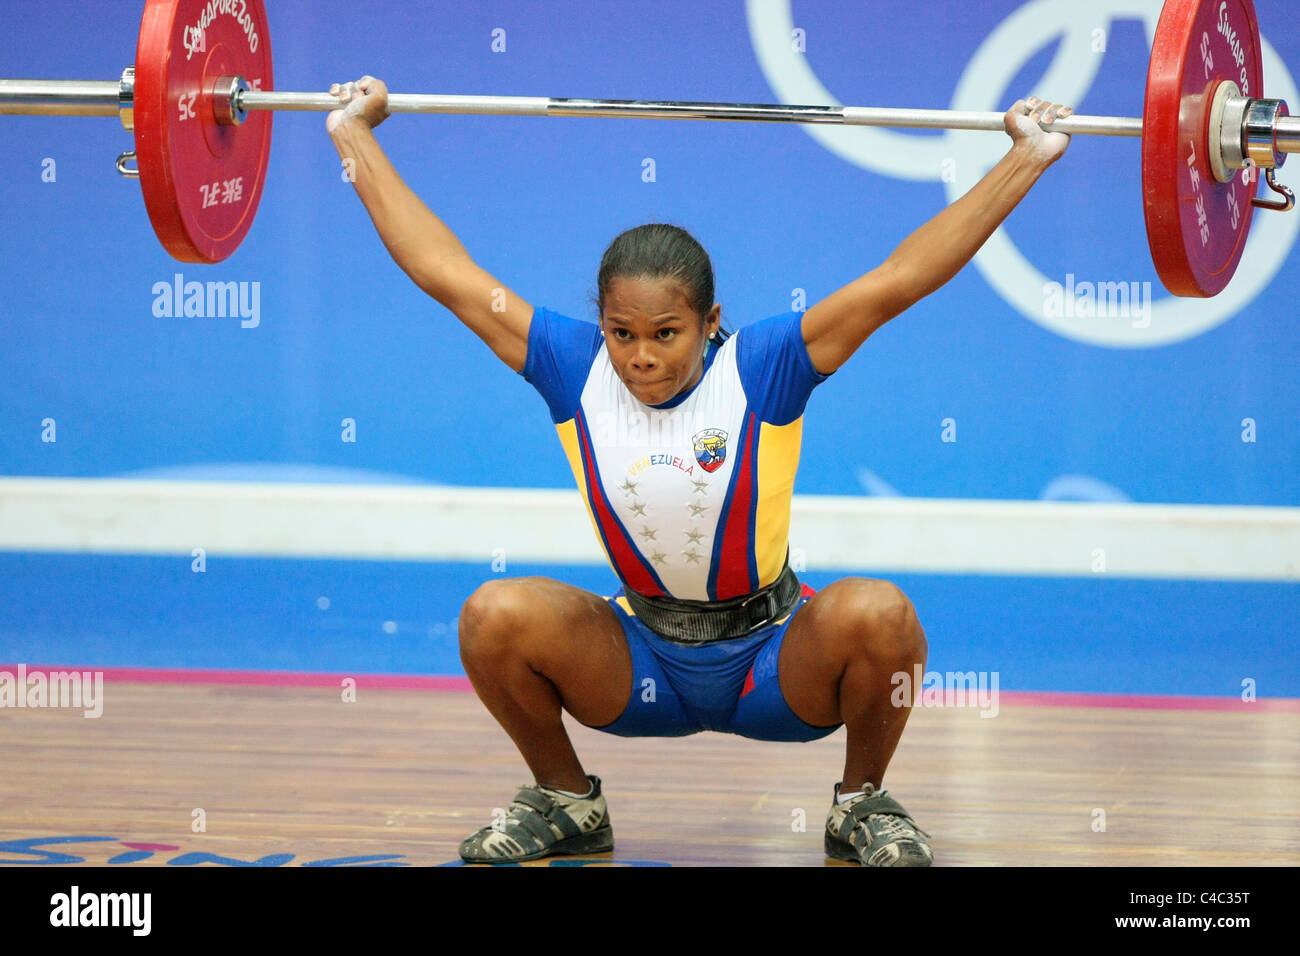 Venezuela's Genesis Rodriguez in action during her snatch routine. - Stock Image